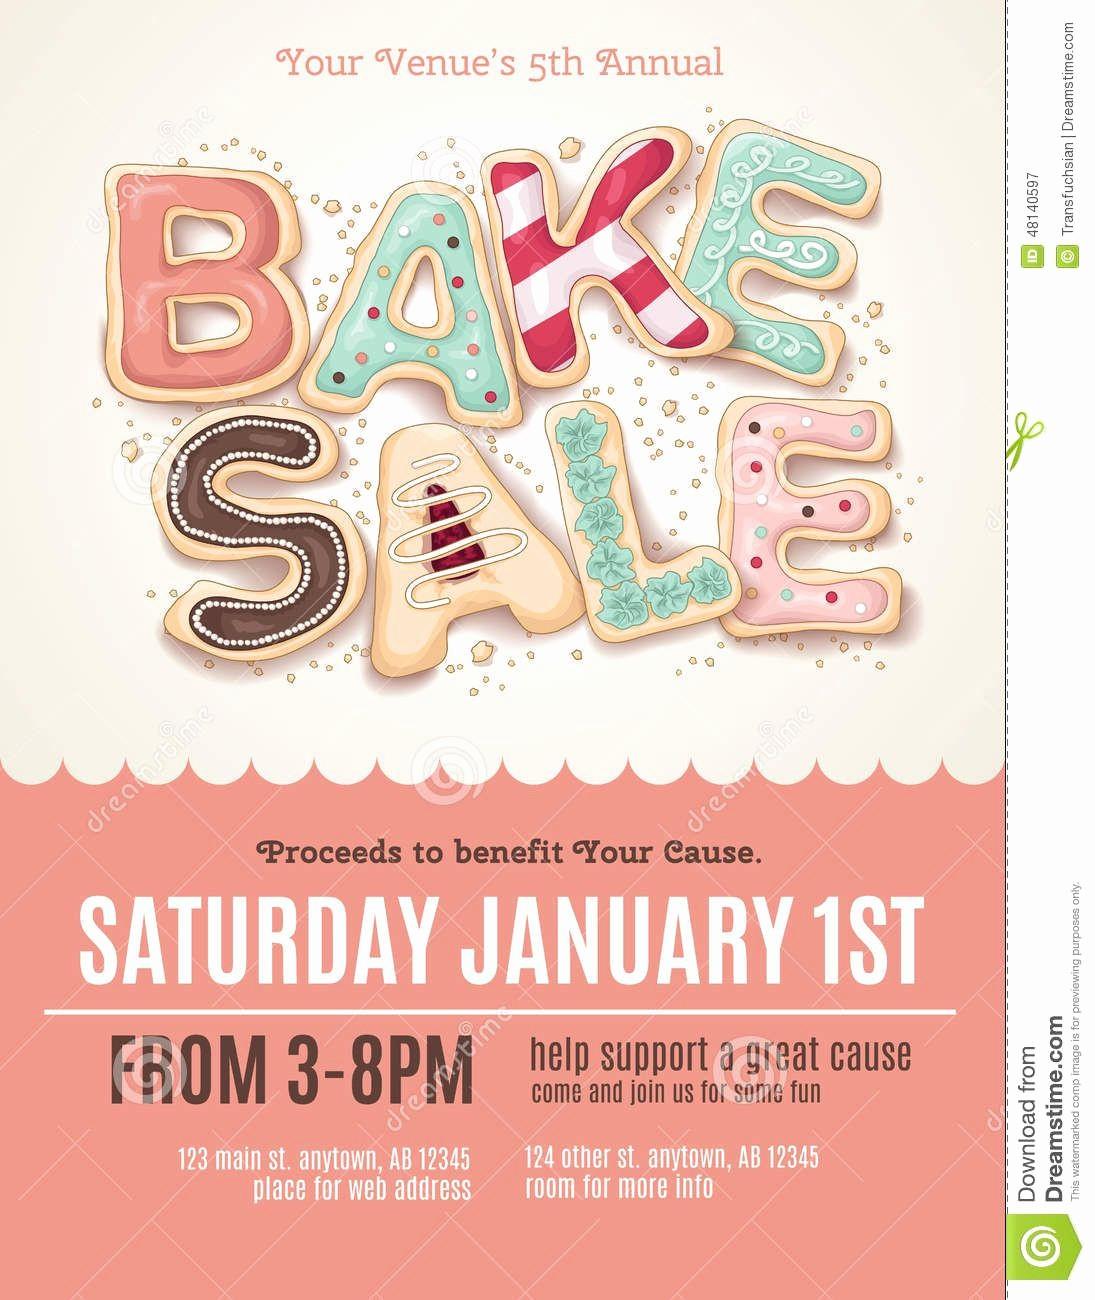 Bake Sale Flyer Template Word Unique Fun Cookie Bake Sale Flyer Template Download From Over